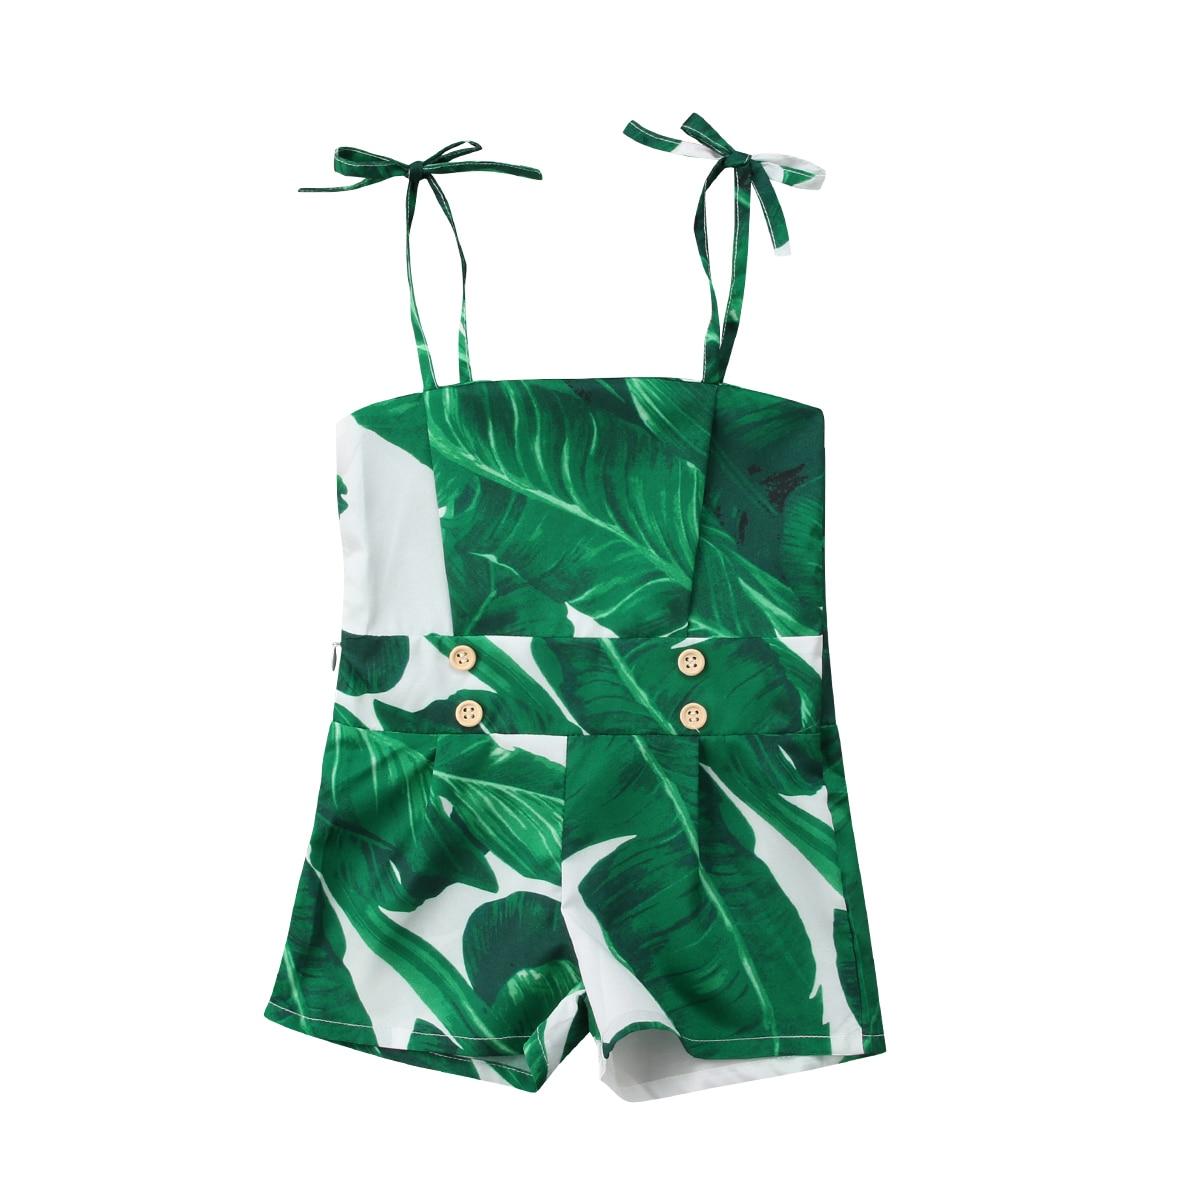 Outfit Romper Newborn Baby-Girl Fashion Summer Green Jumpsuit Leaf-Pattern Off-Shoulder